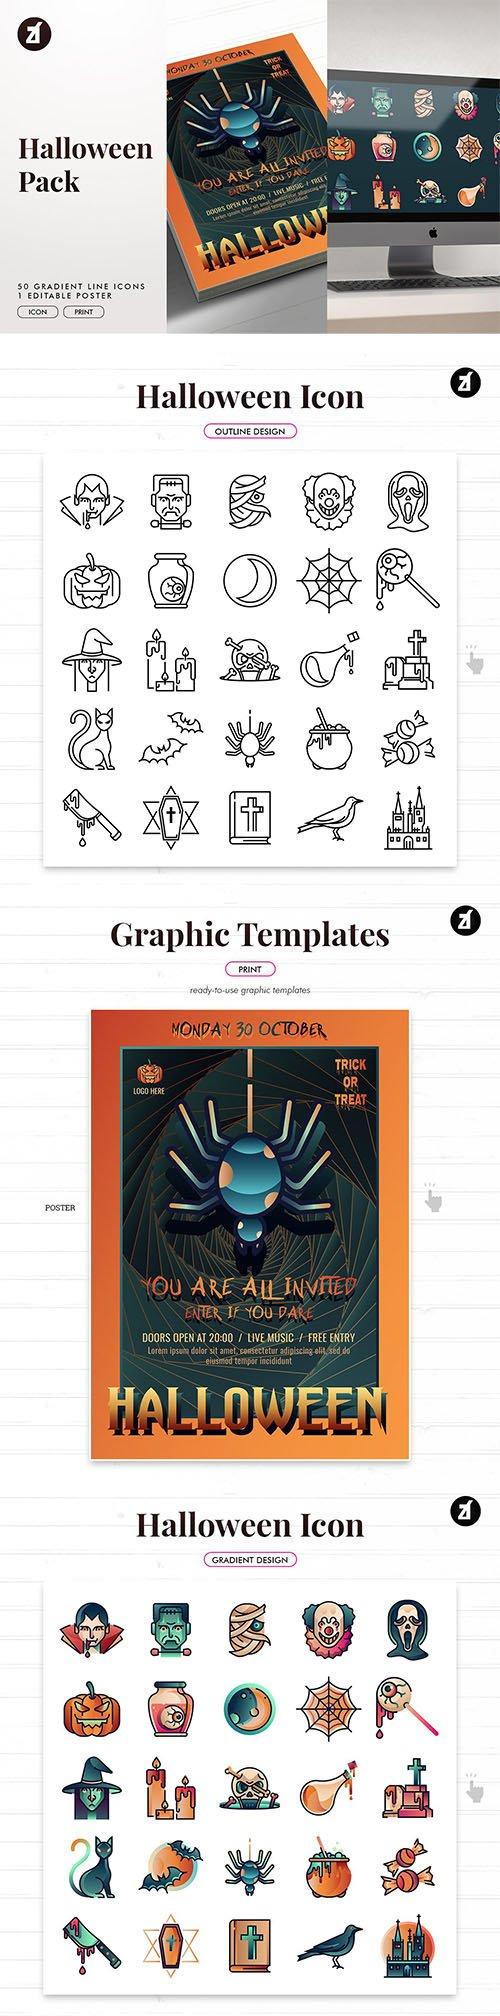 Halloween icon pack with bonus graphic templates 2